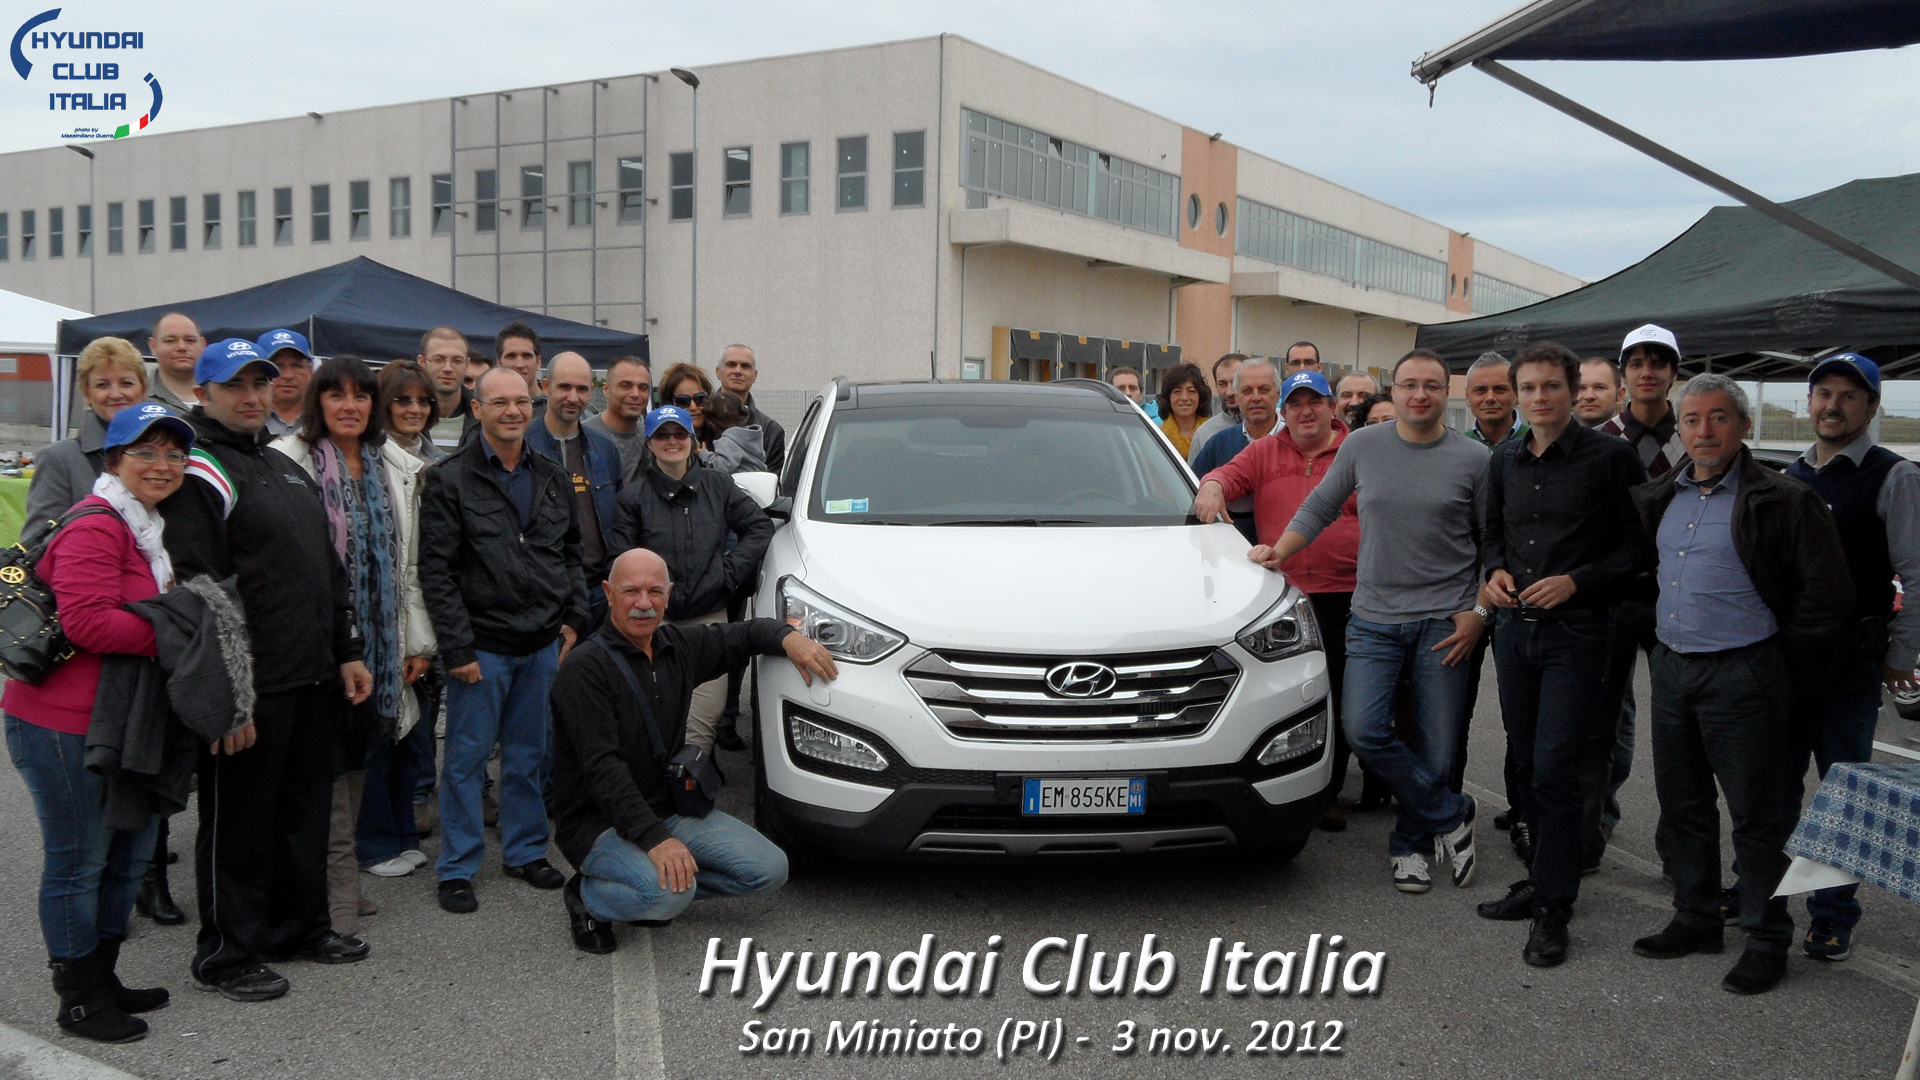 https://www.hyundai-club.eu/hcipictures/albums/userpics/10002/sm_001.jpg